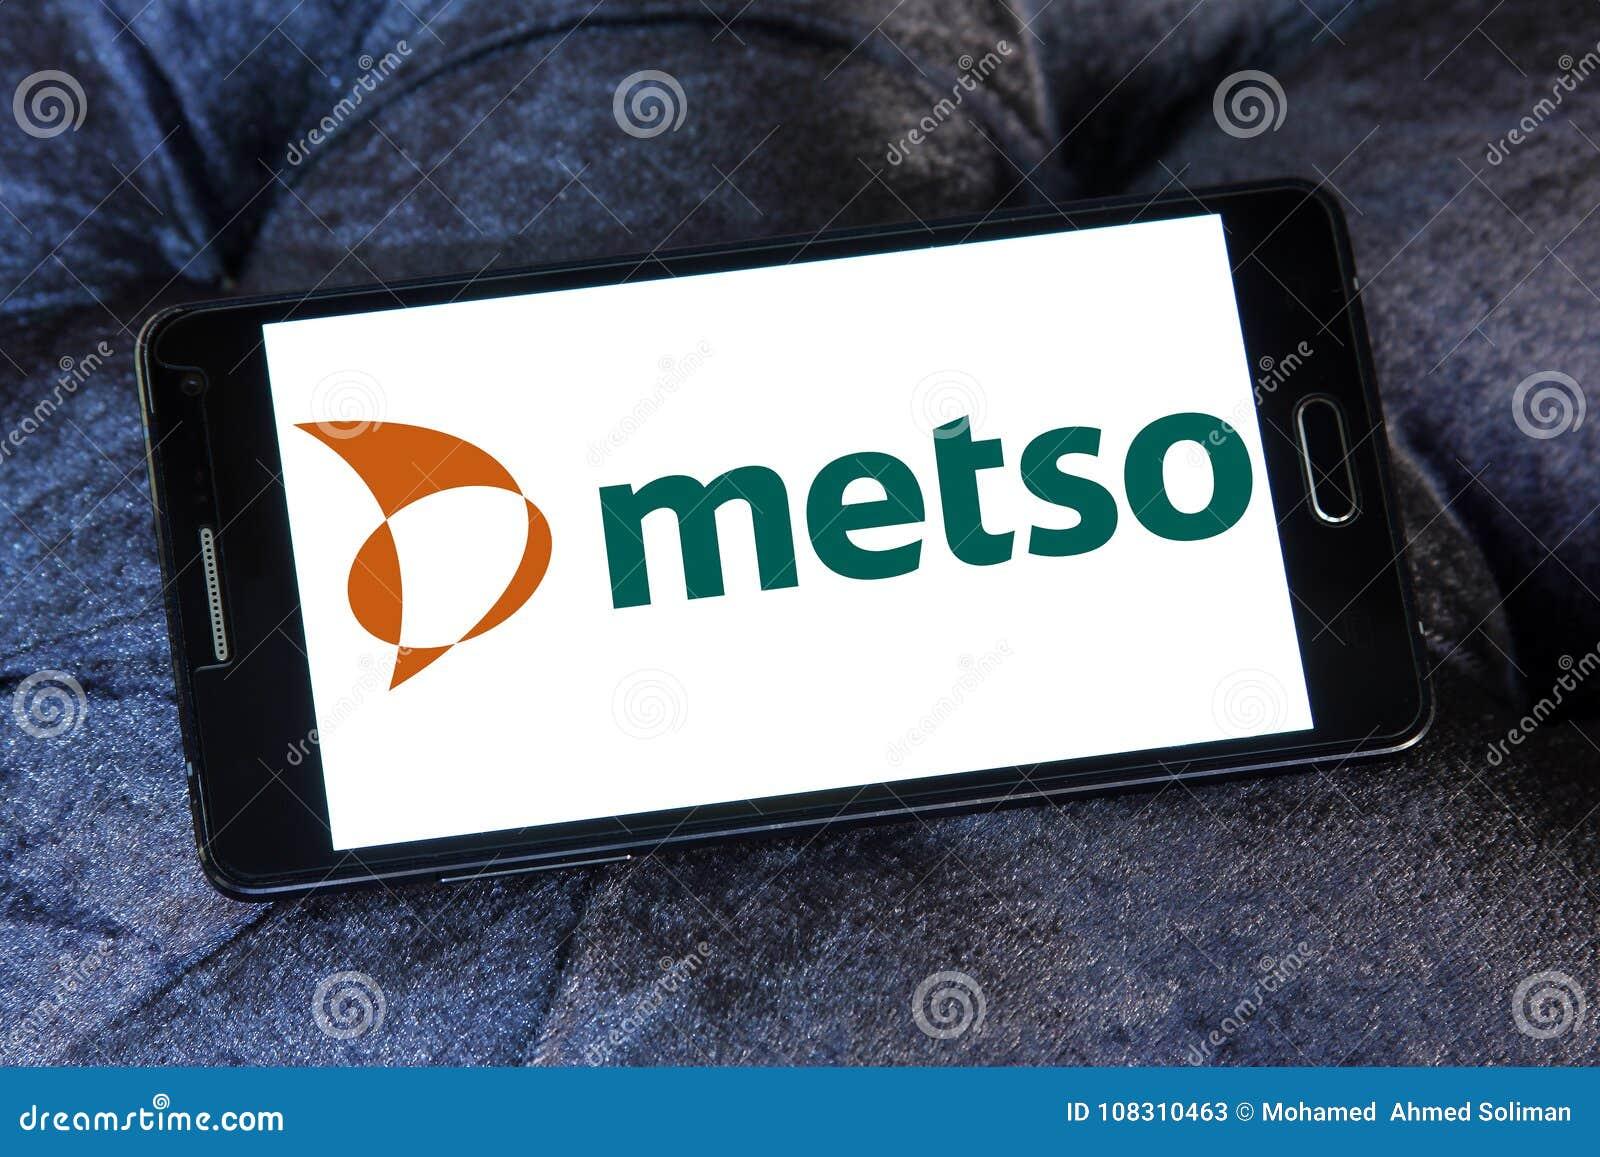 Metso Industrial Machinery Company Logo Editorial Stock